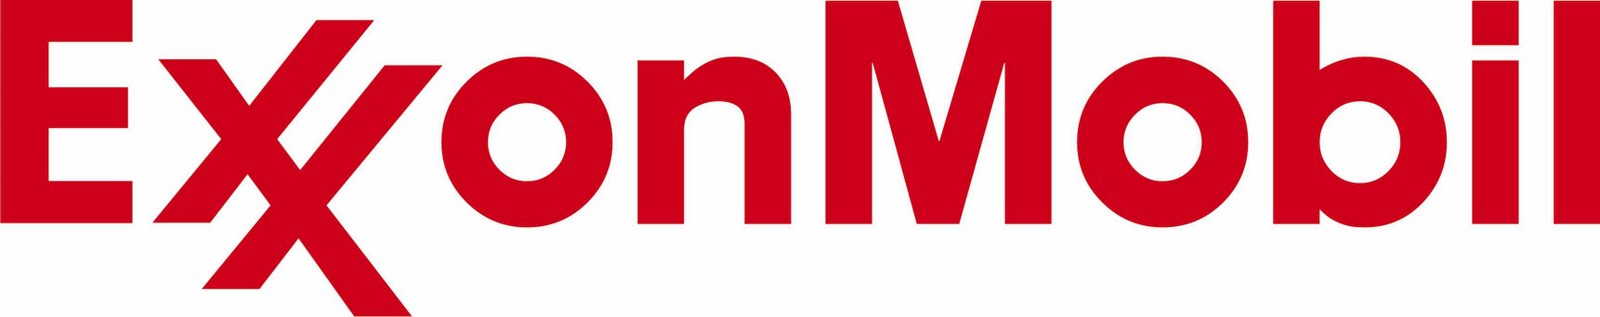 ExxonMobil Nigeria Recruitment 2018